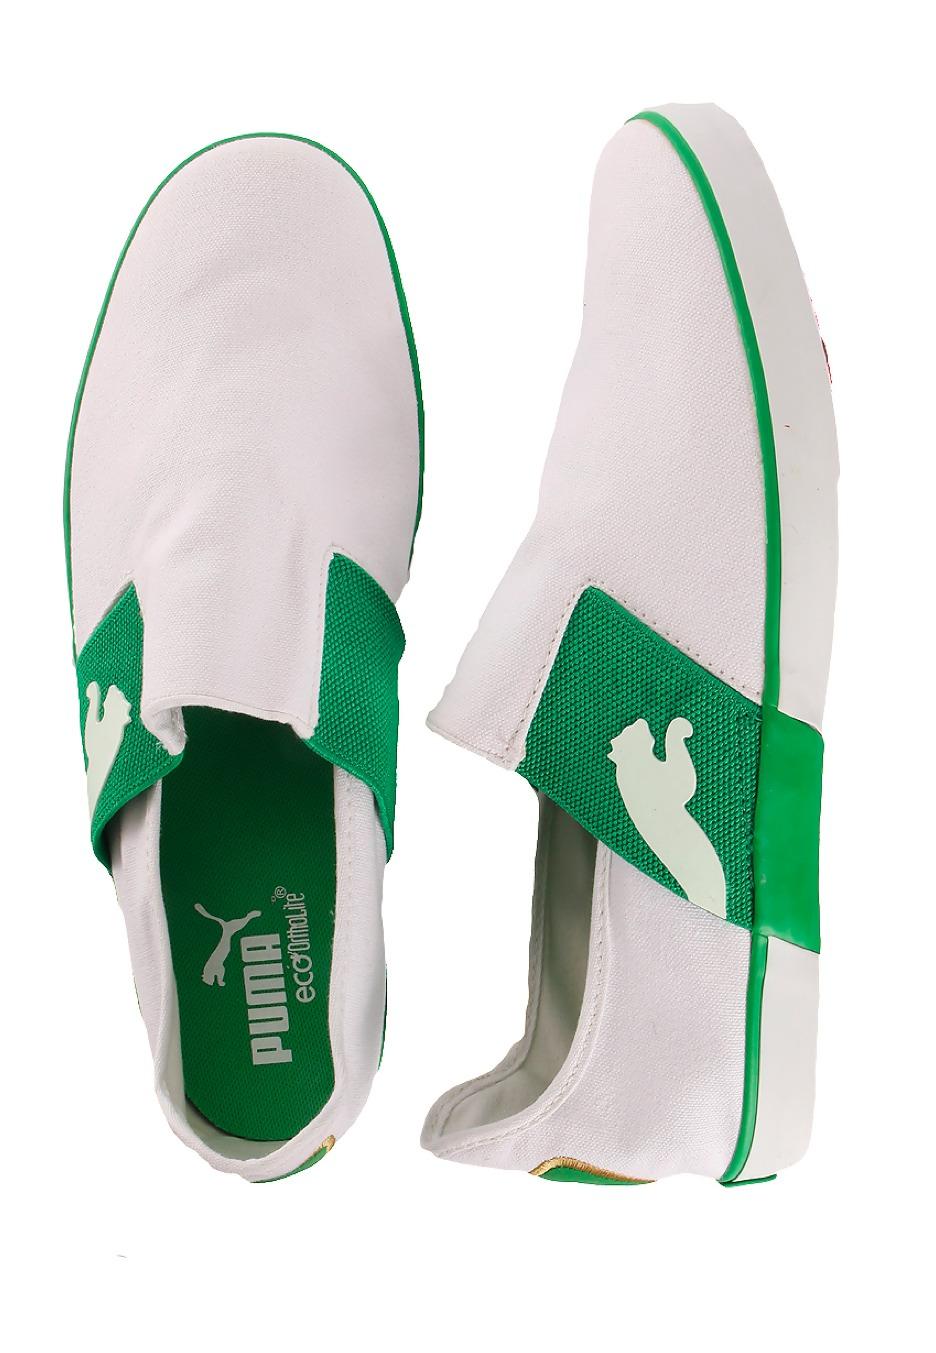 41ac589abb26 Puma - Lazy Slip-On White Fern Green - Shoes - Impericon.com Worldwide